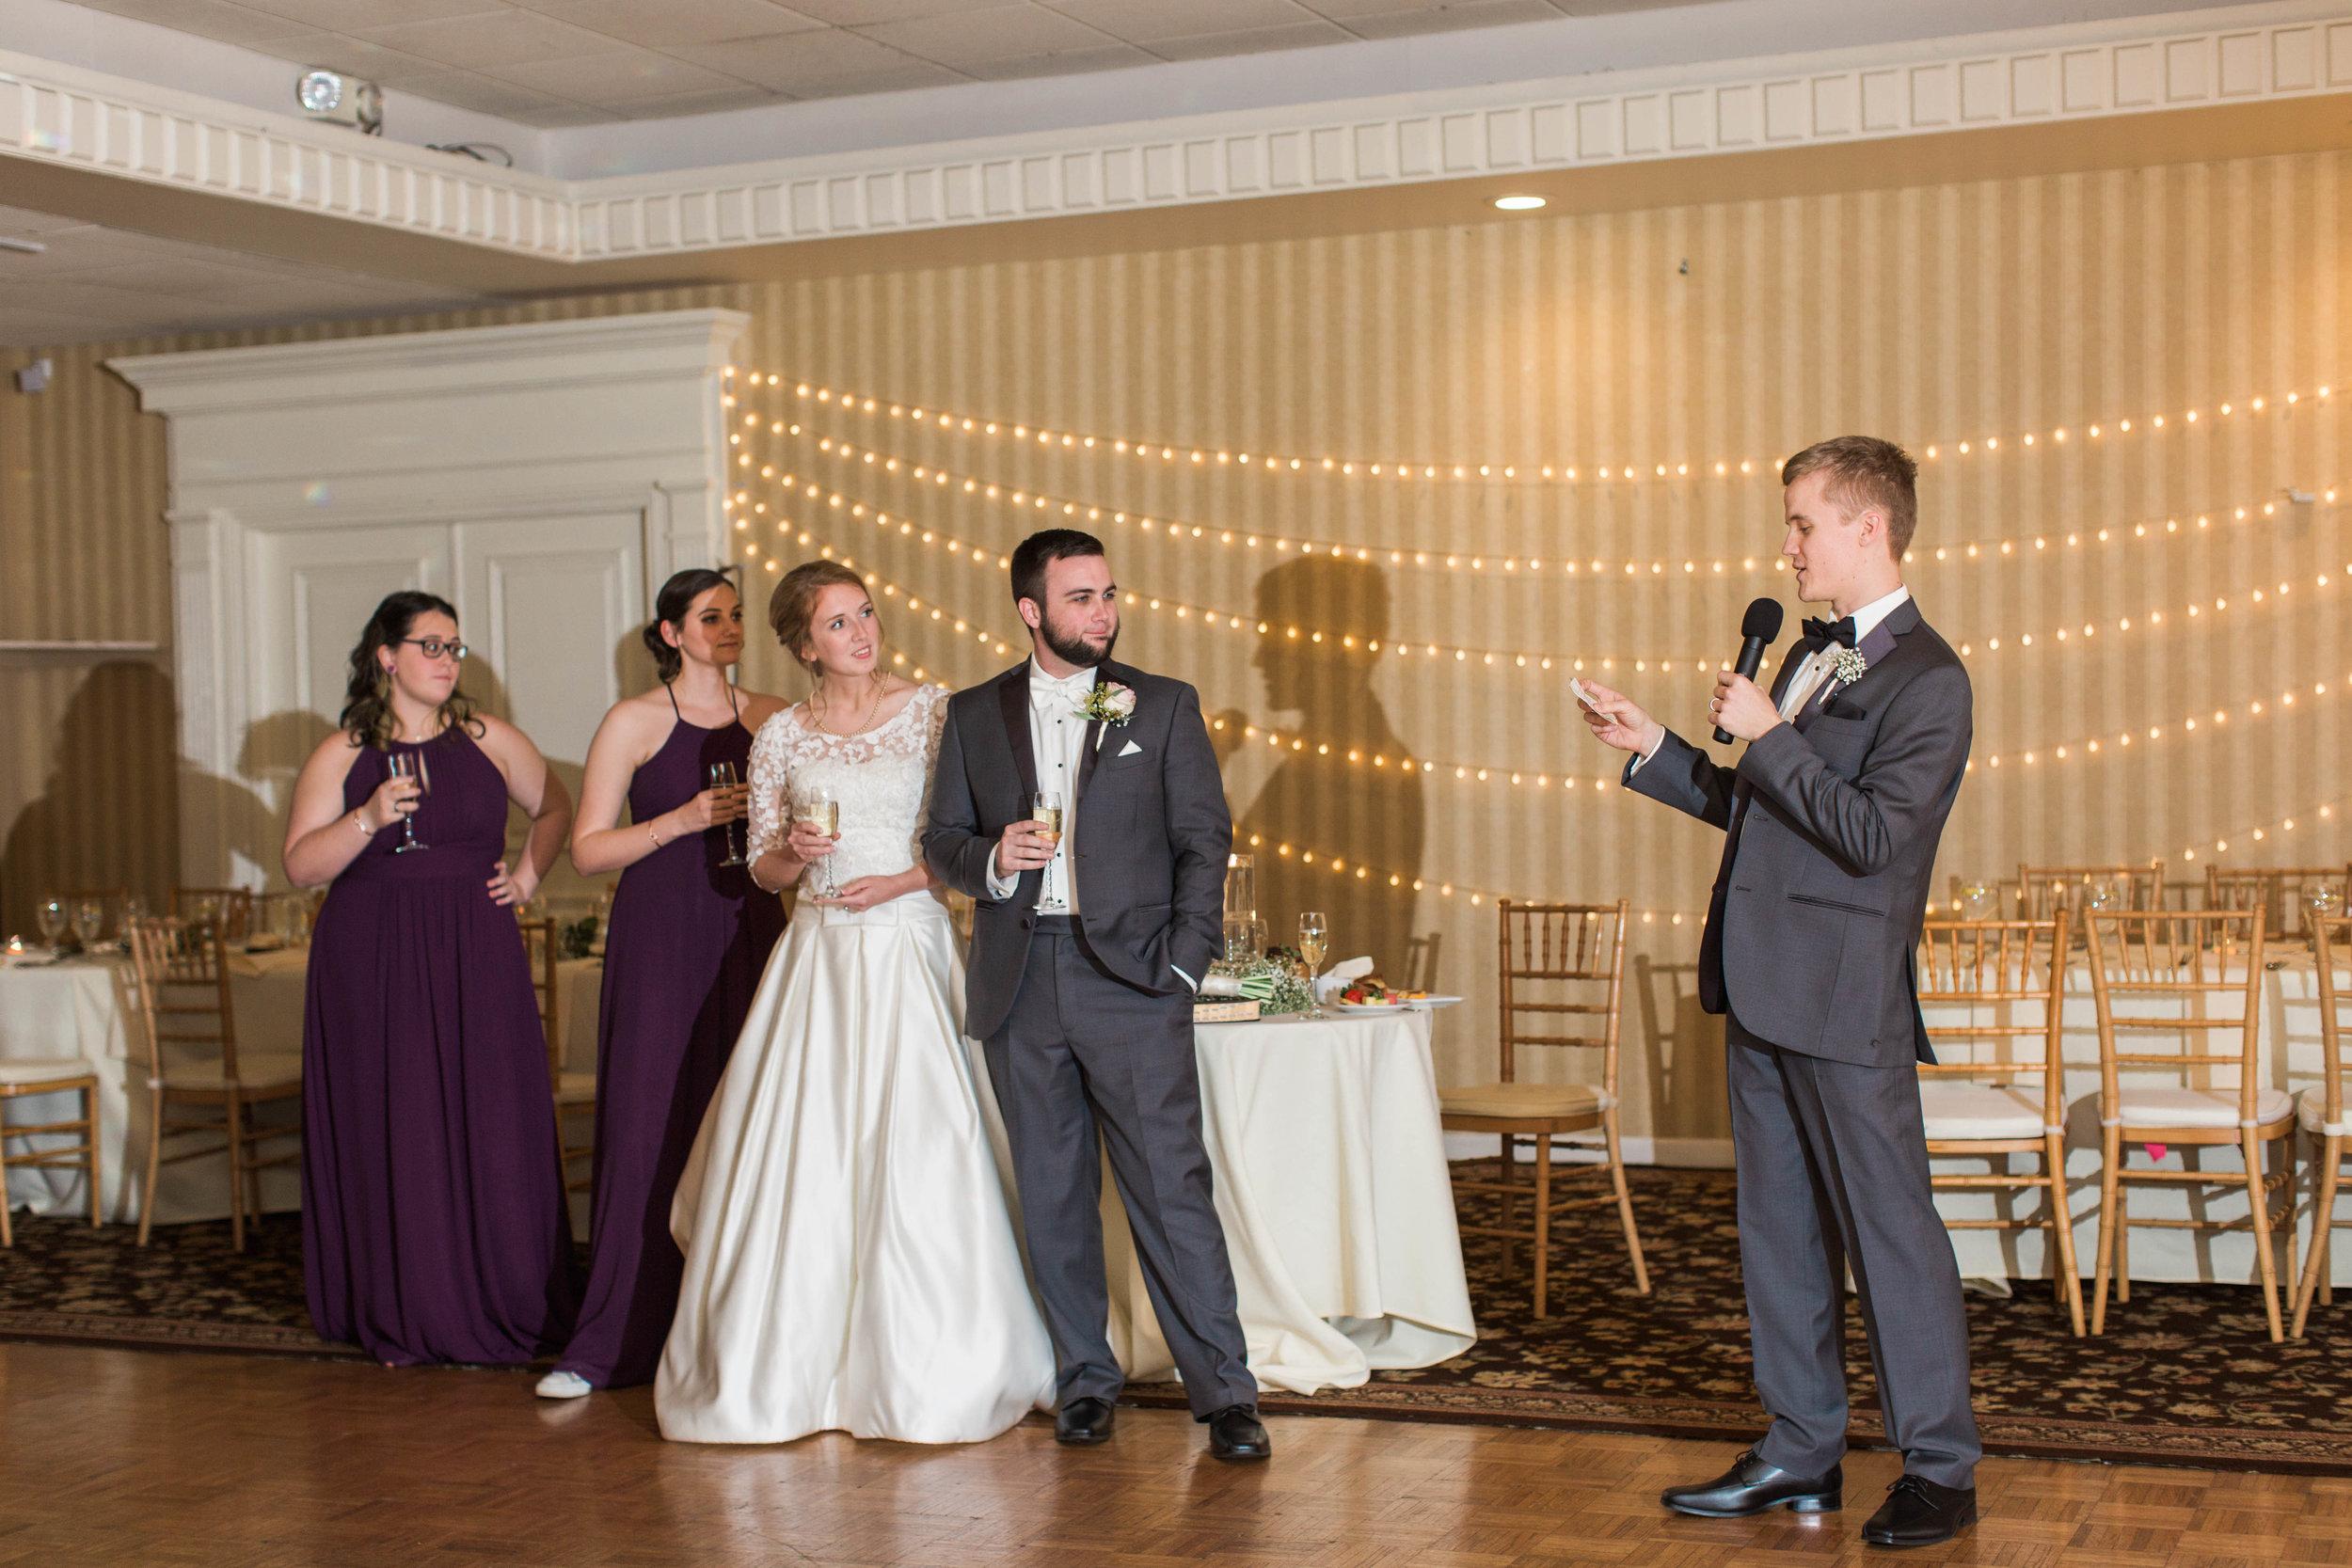 Beaumont Texas Country Club wedding-6187.jpg